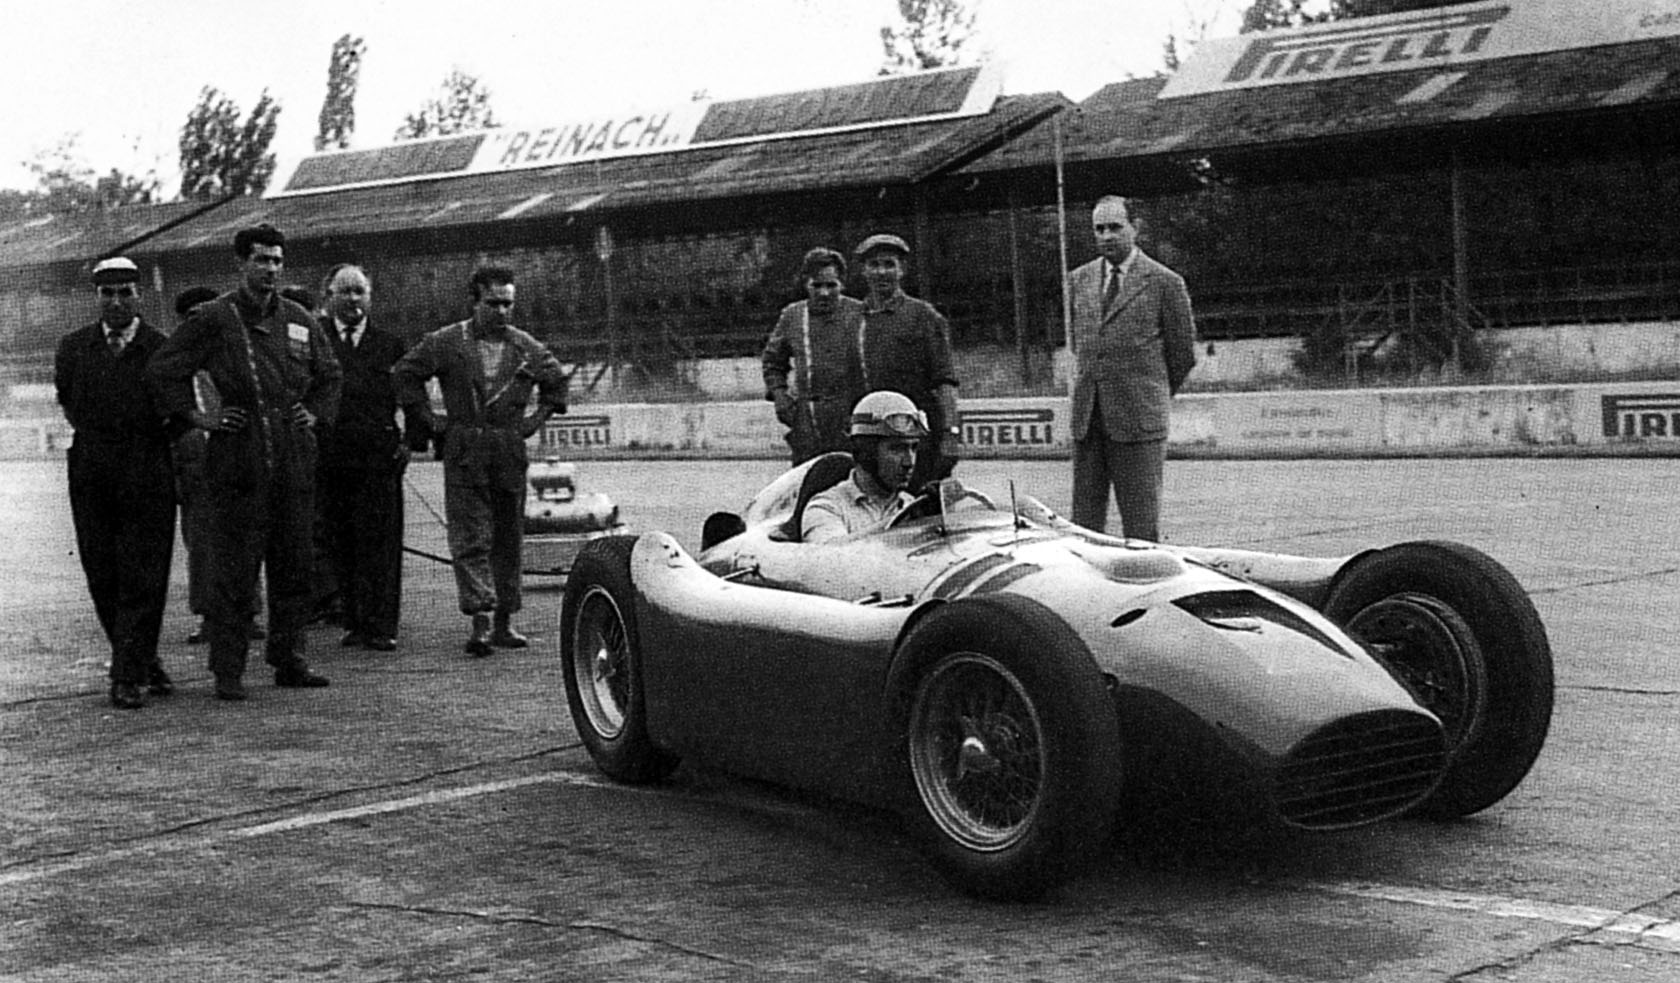 Alberto Ascari testing the D50 at Monza, 1954.